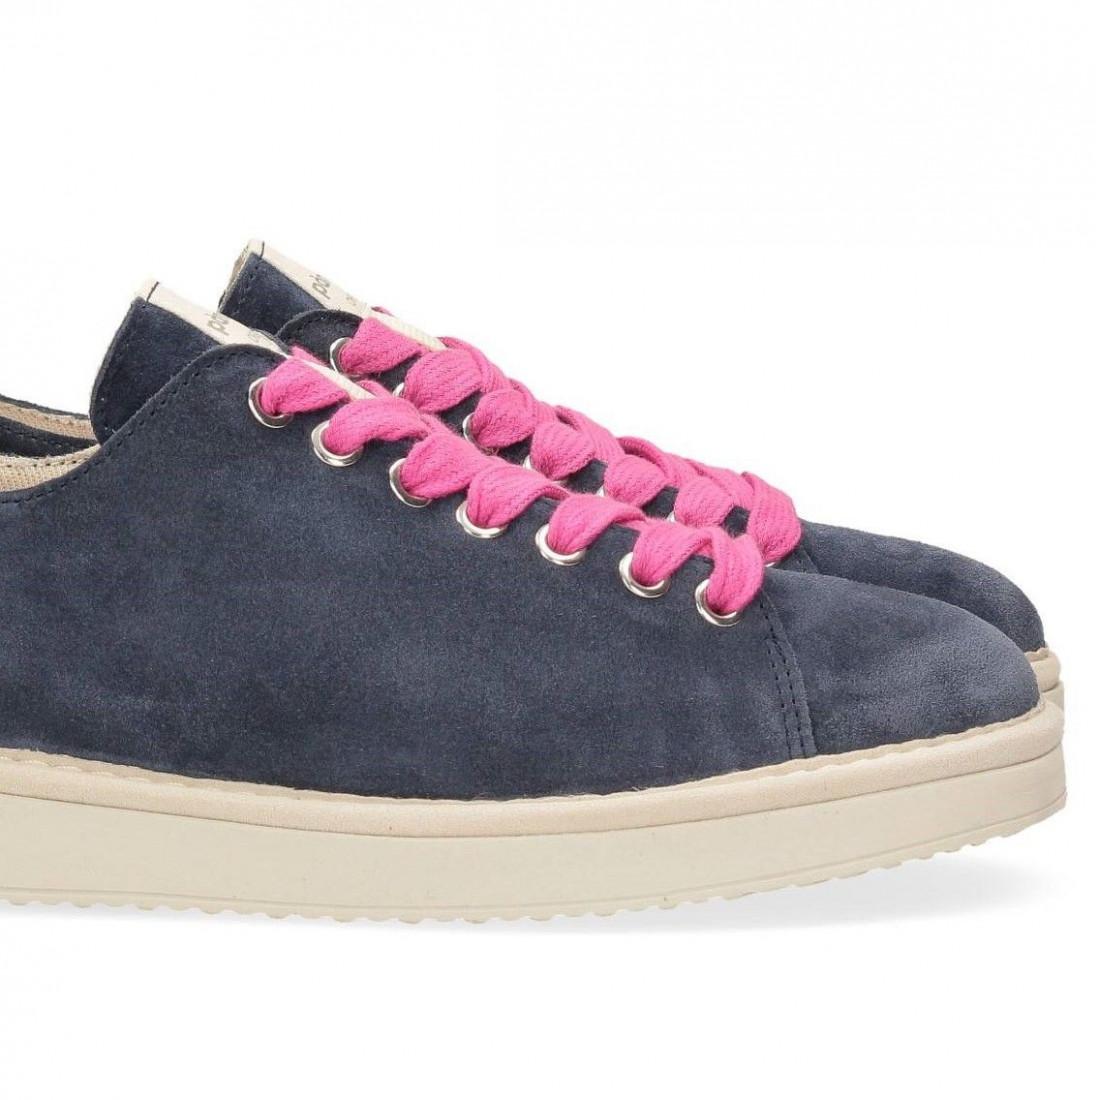 sneakers woman panchic p01w14001s4a00430 fuxia 6830